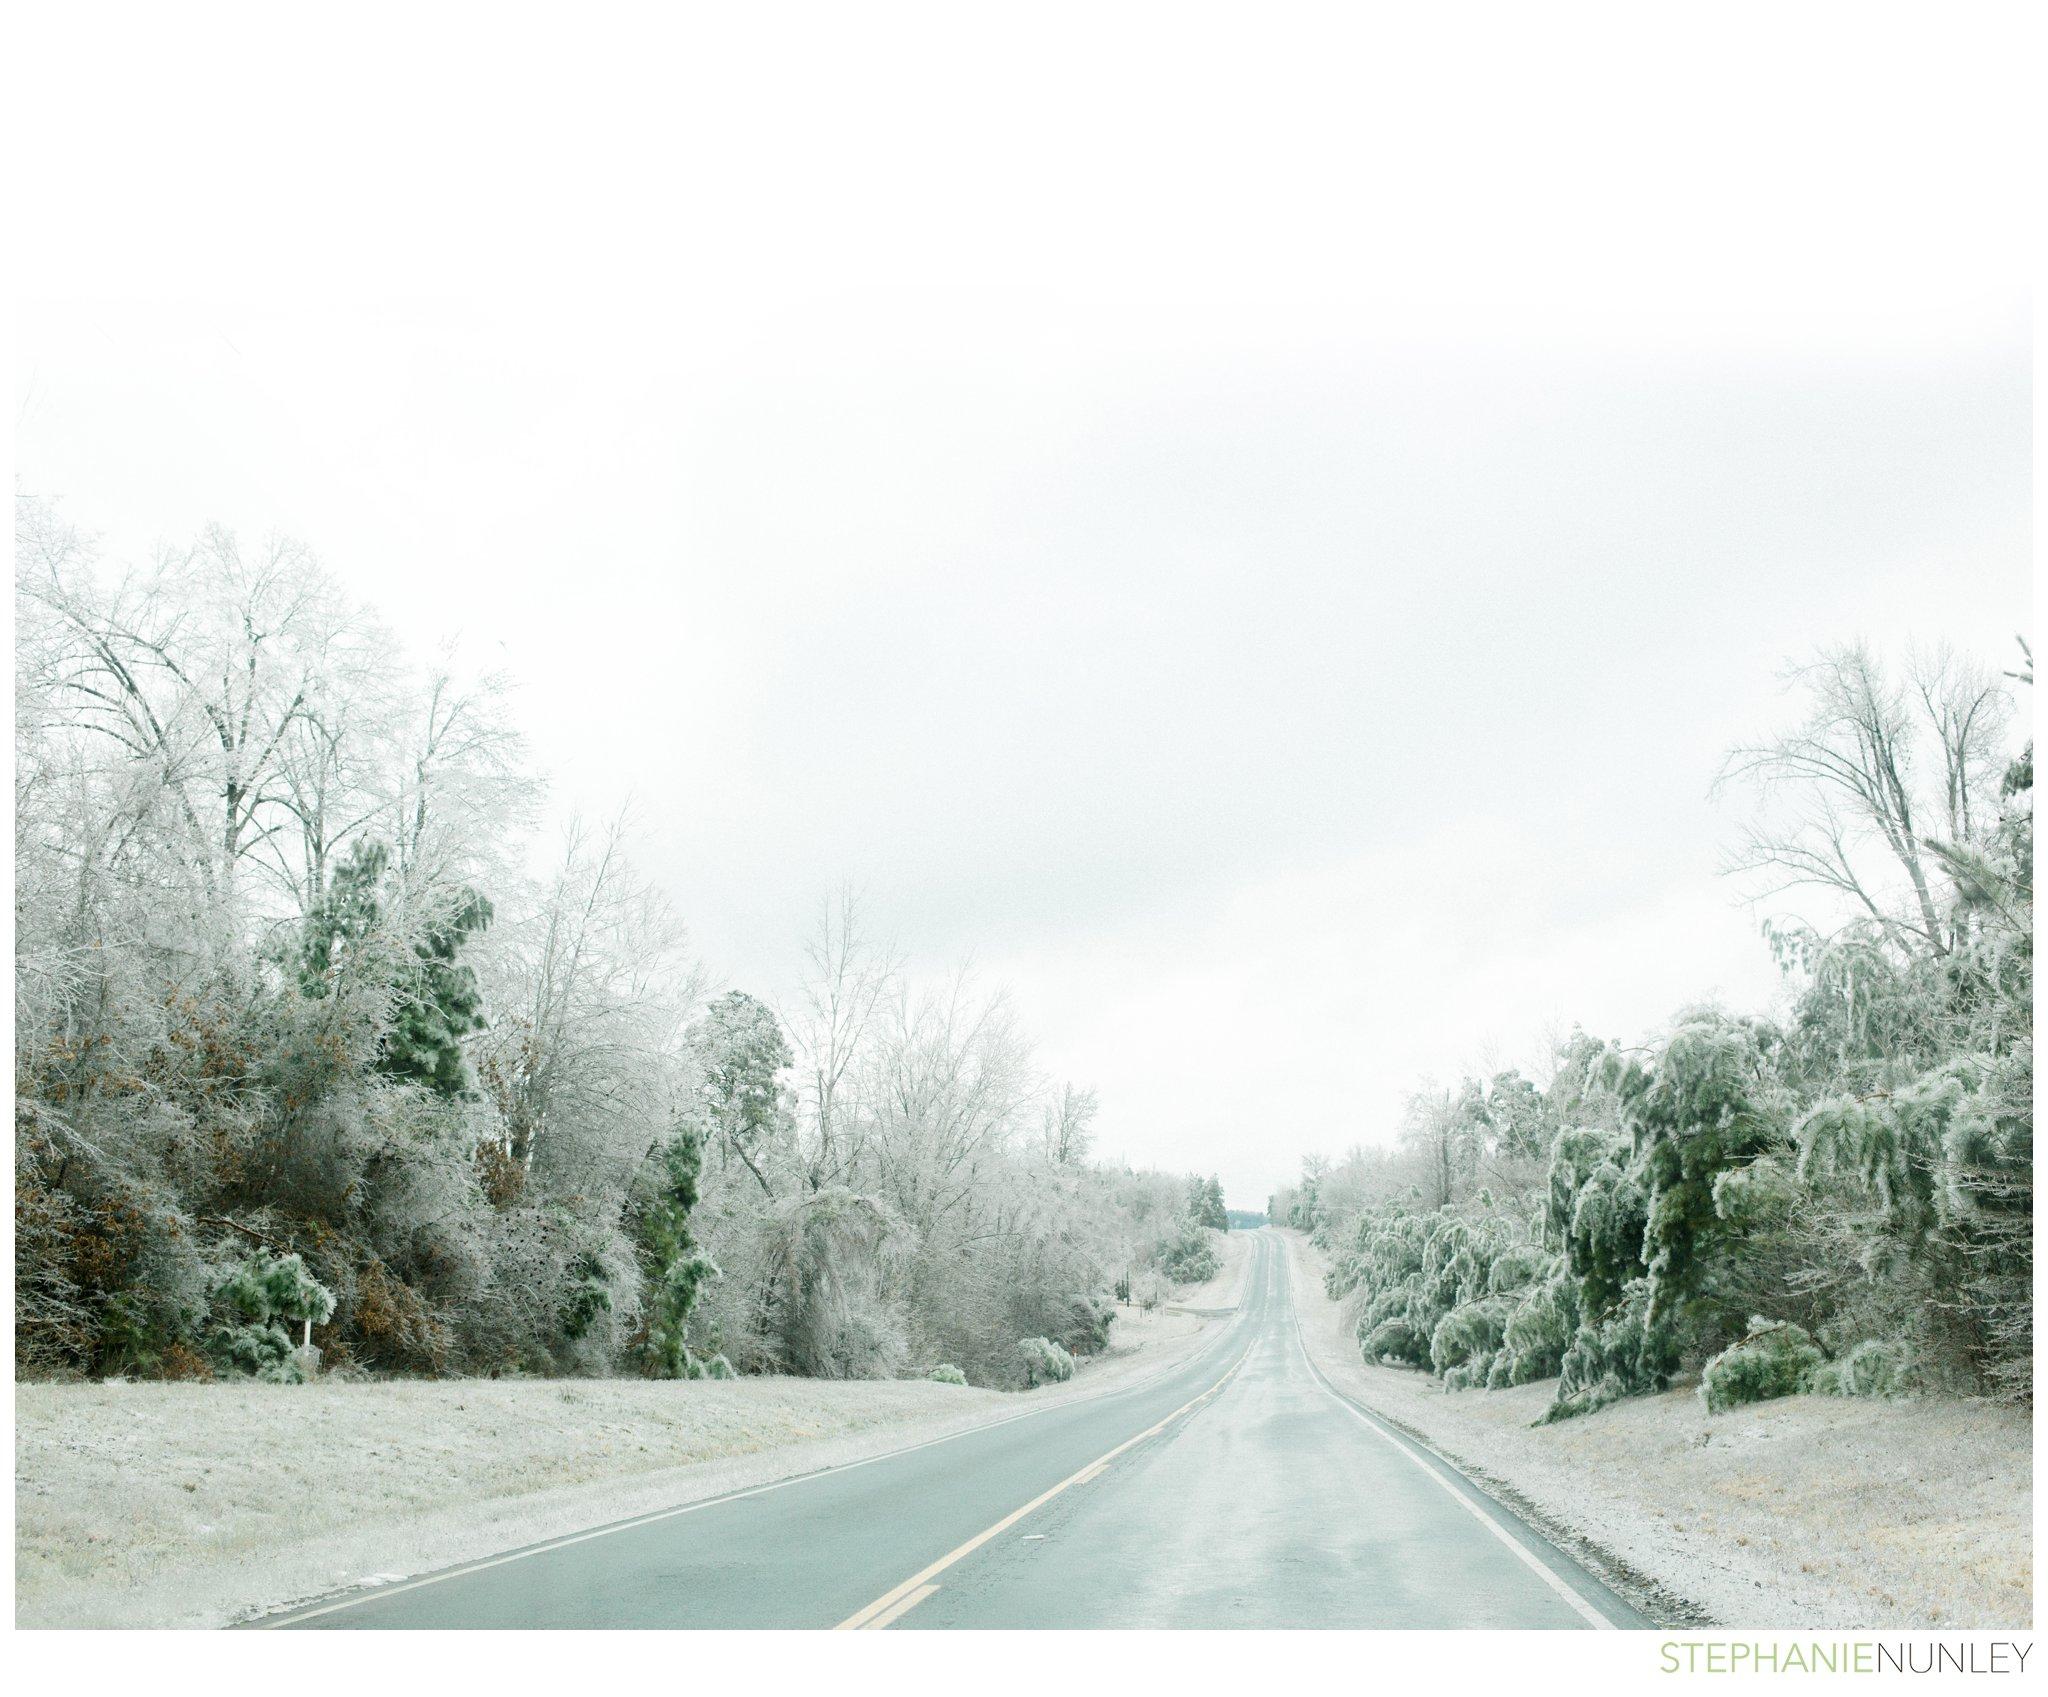 arkansas-winter-scenery-004.jpg